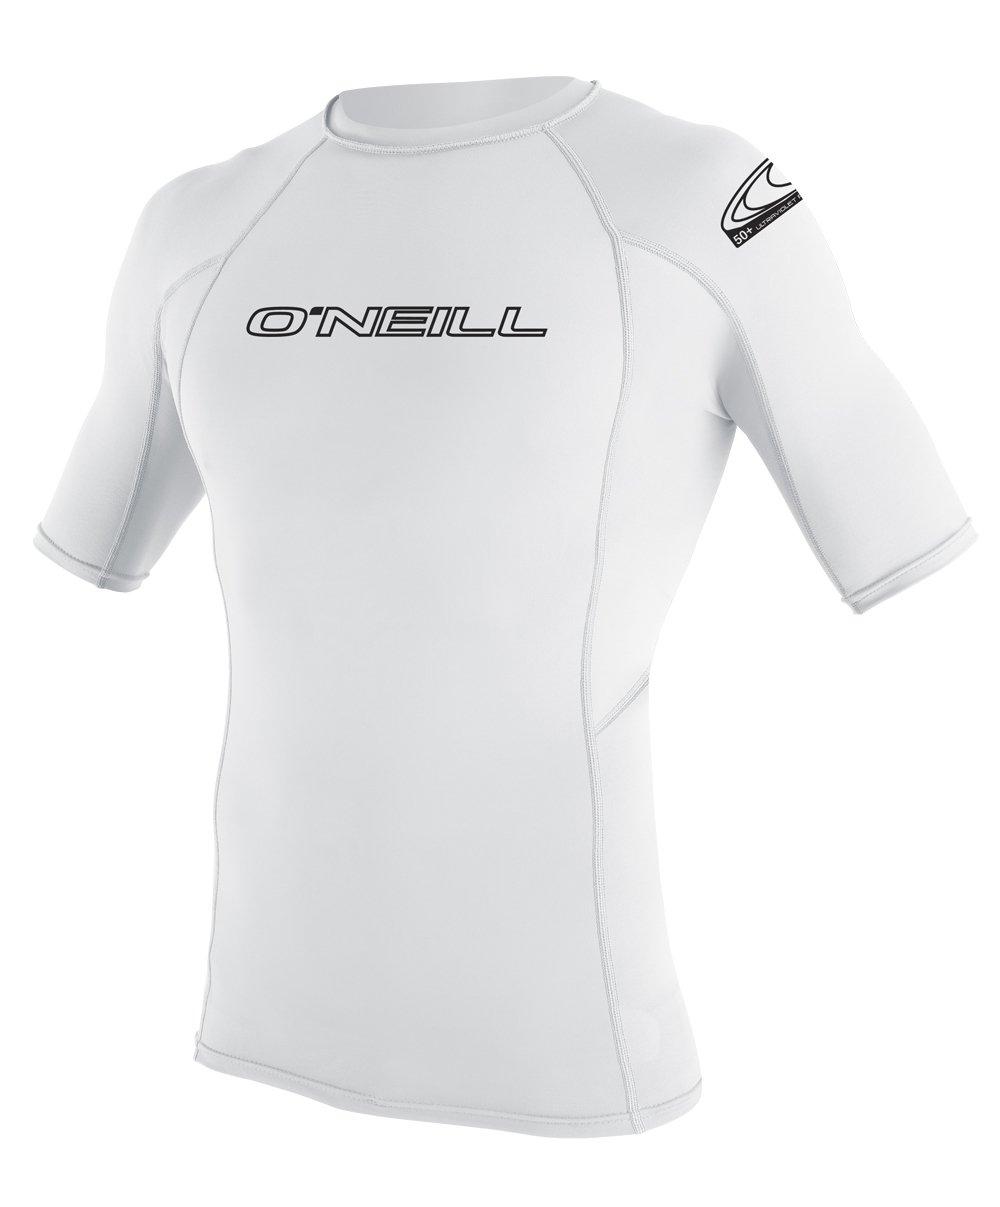 O'Neill  UV Sun Protection Youth Basic Skins Short Sleeve Crew Sun Shirt Rash Guard, White, 12